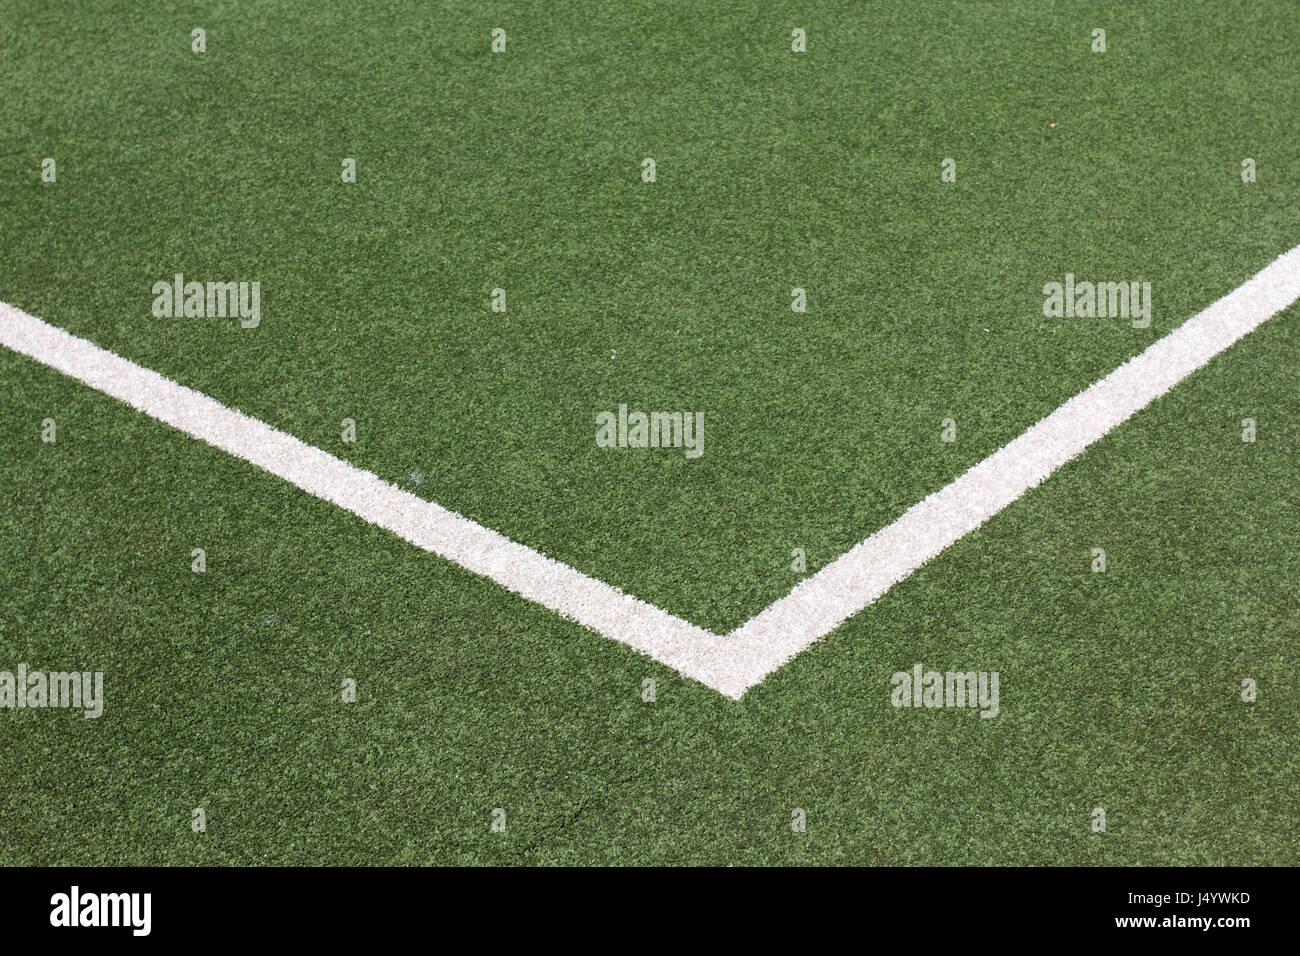 Pitch marquage sur astro turf terrain de hockey, kandivali, Mumbai, Maharashtra, Inde, Asie Banque D'Images